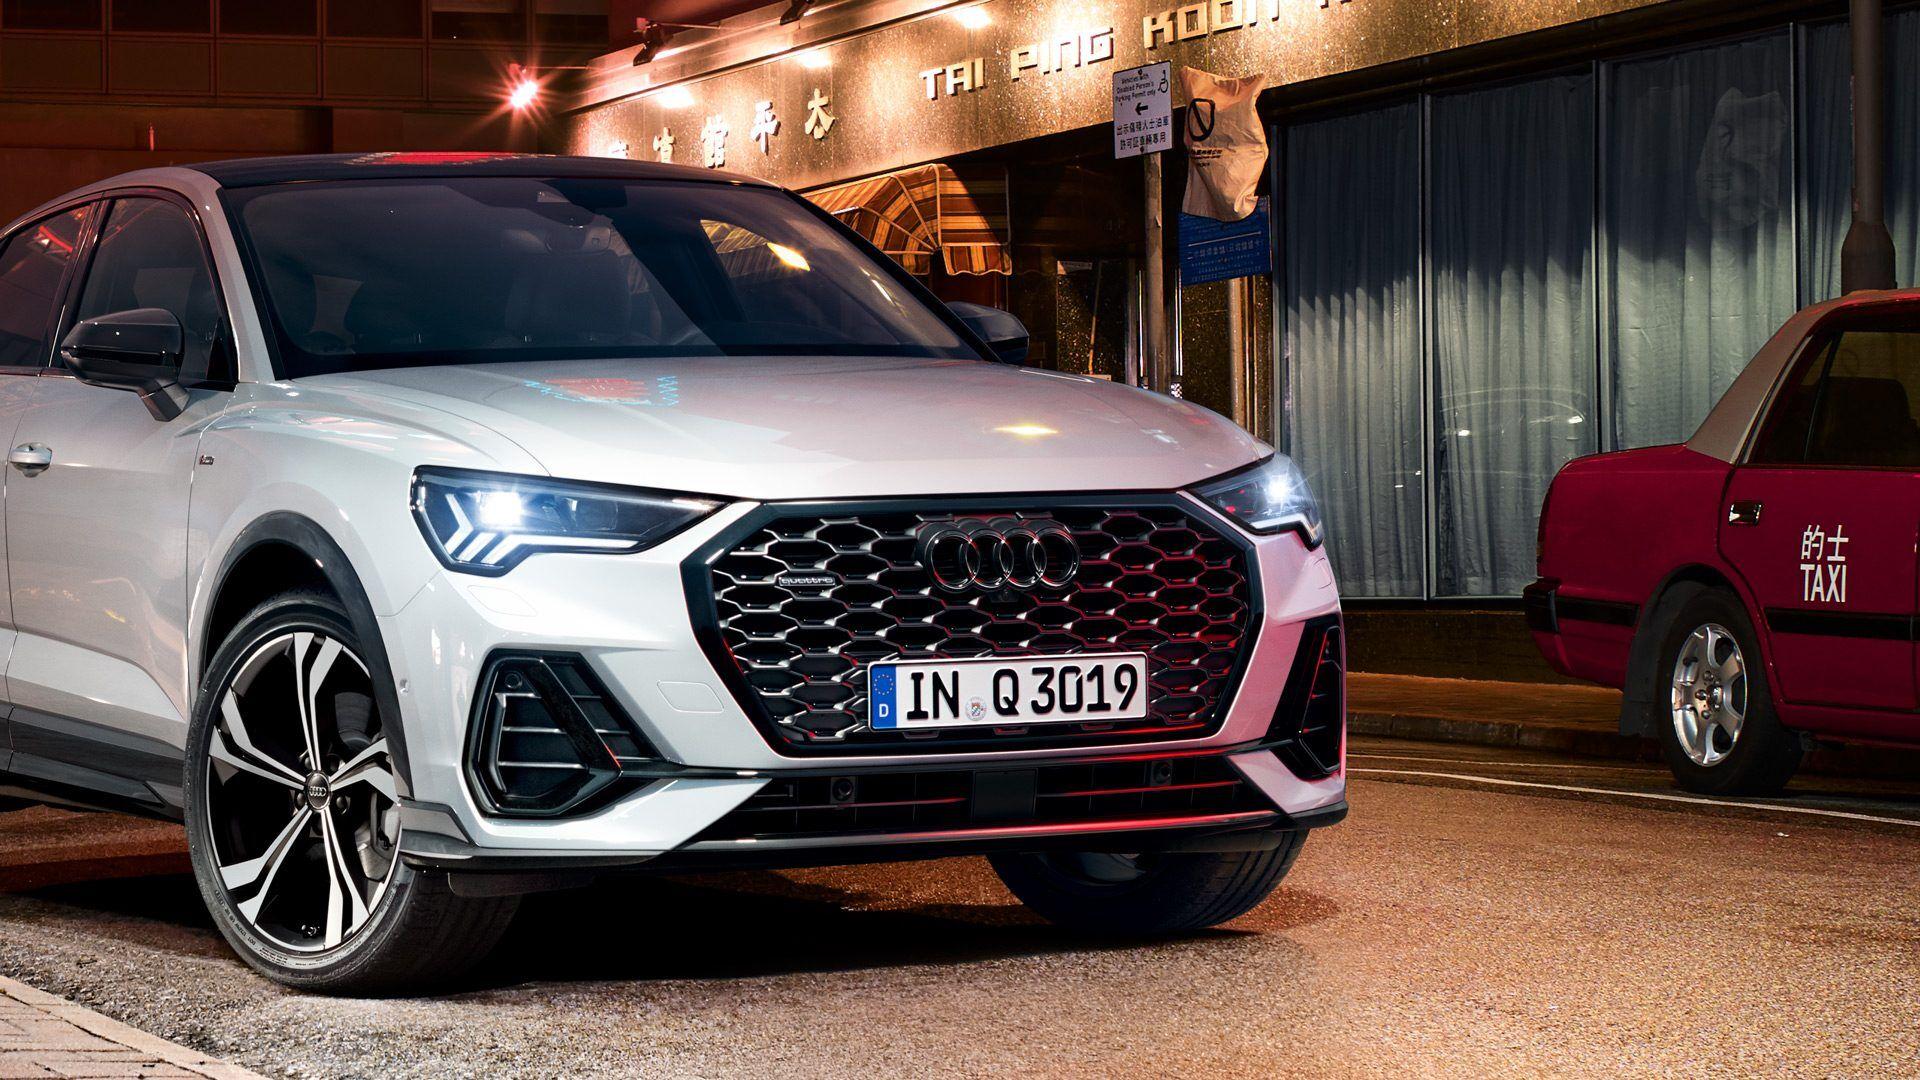 Kekurangan Audi Q3 Km 0 Spesifikasi